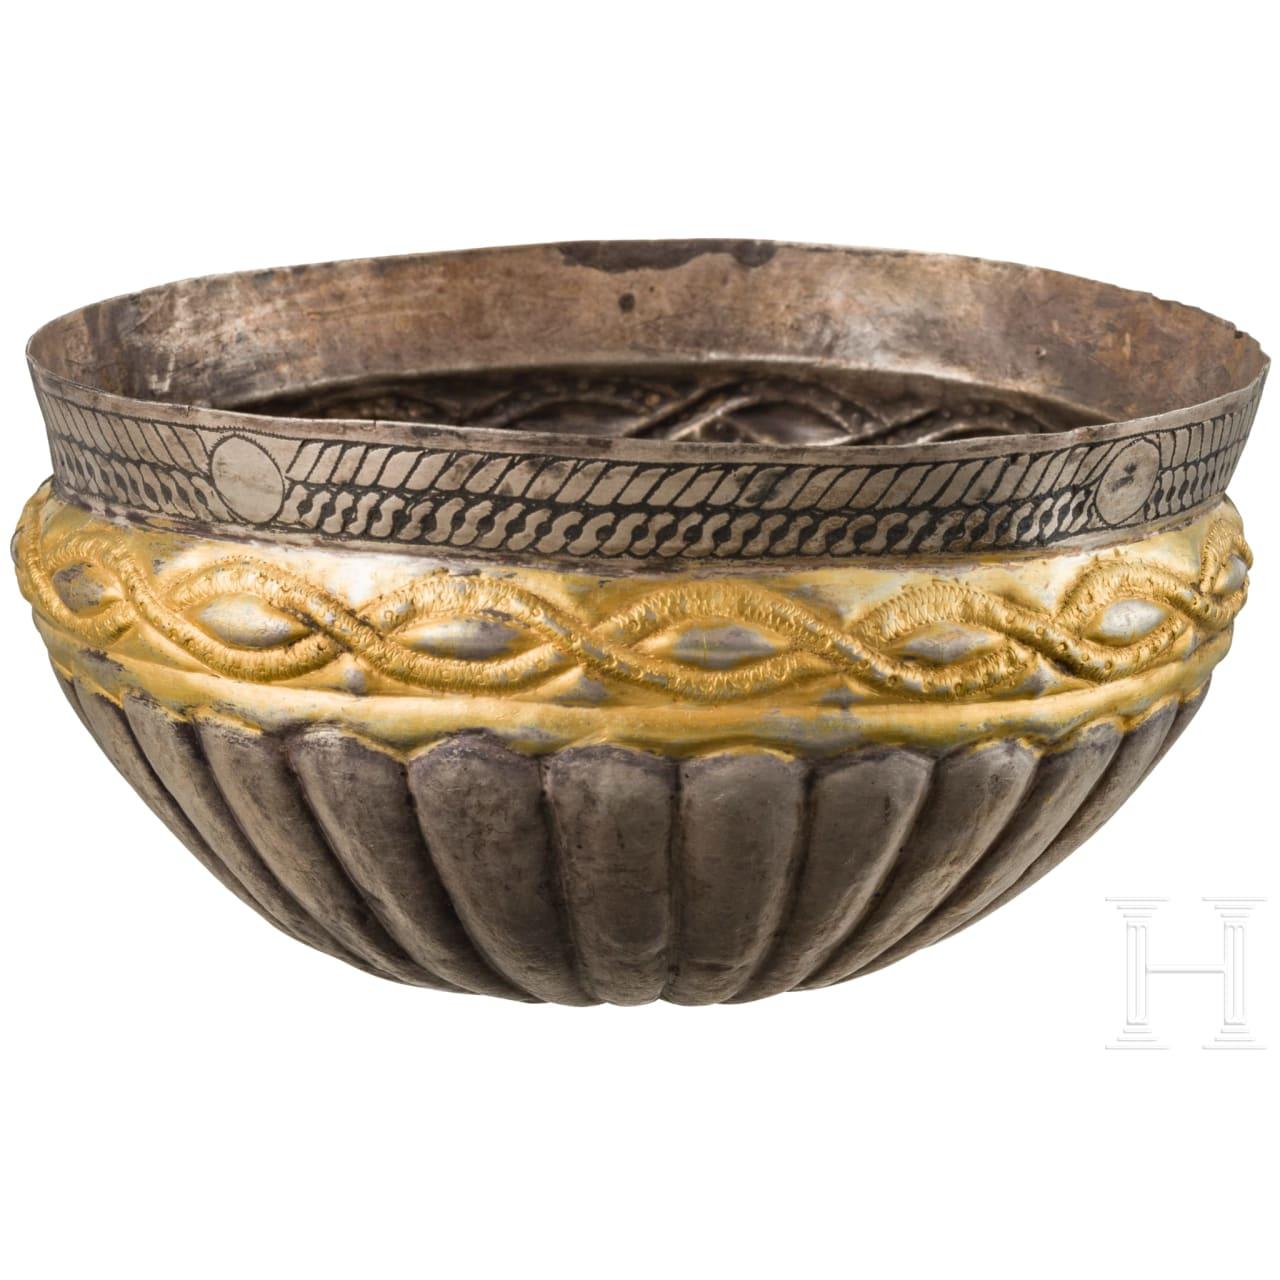 An East European silver Viking bowl, partially gilded, 11th - 12th century